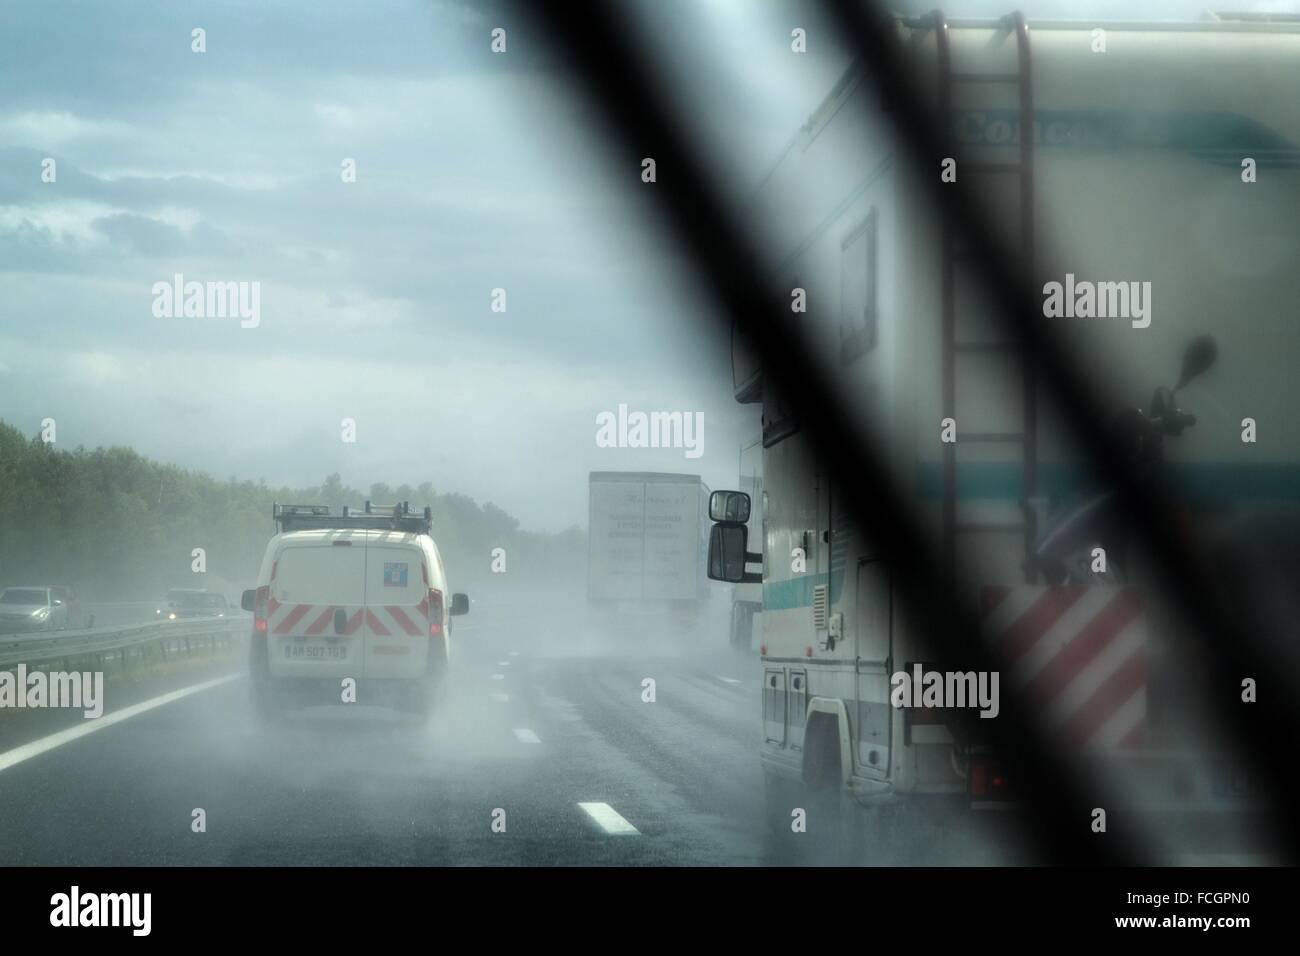 ILLUSTRATION OF MOTORWAYS - Stock Image